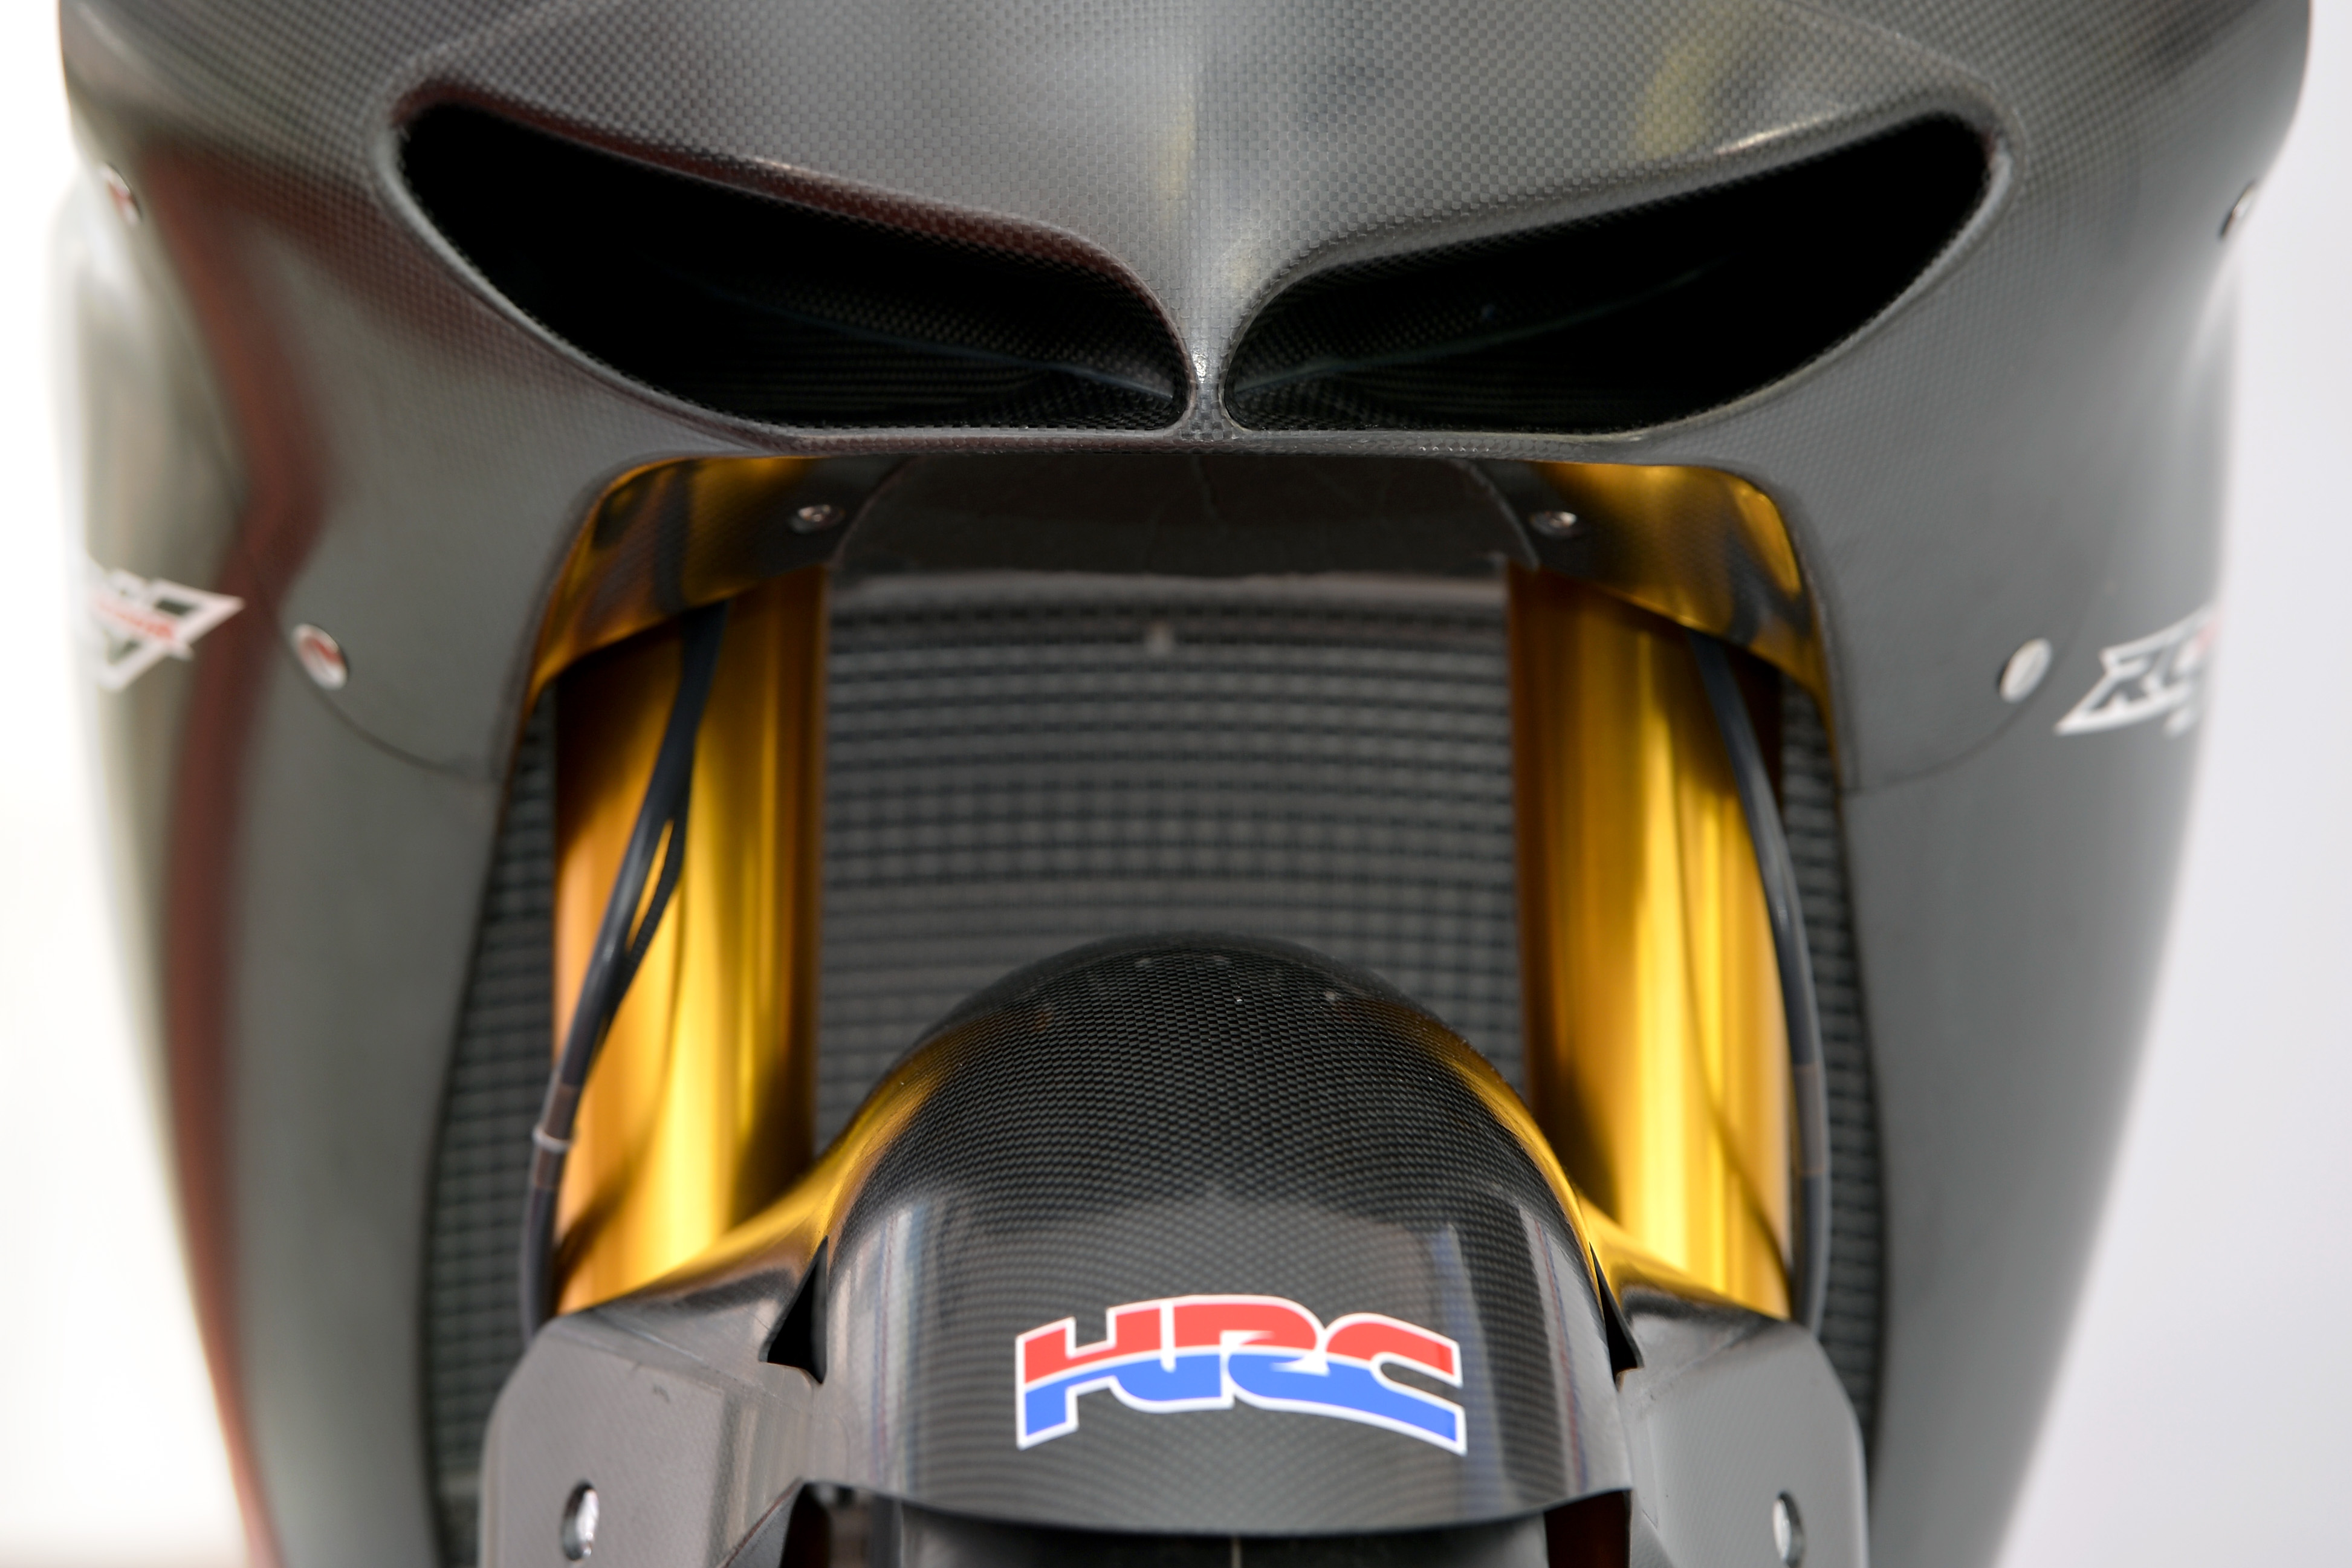 honda_rcv1000r_motogp_production_racer_www_racemoto_com_005